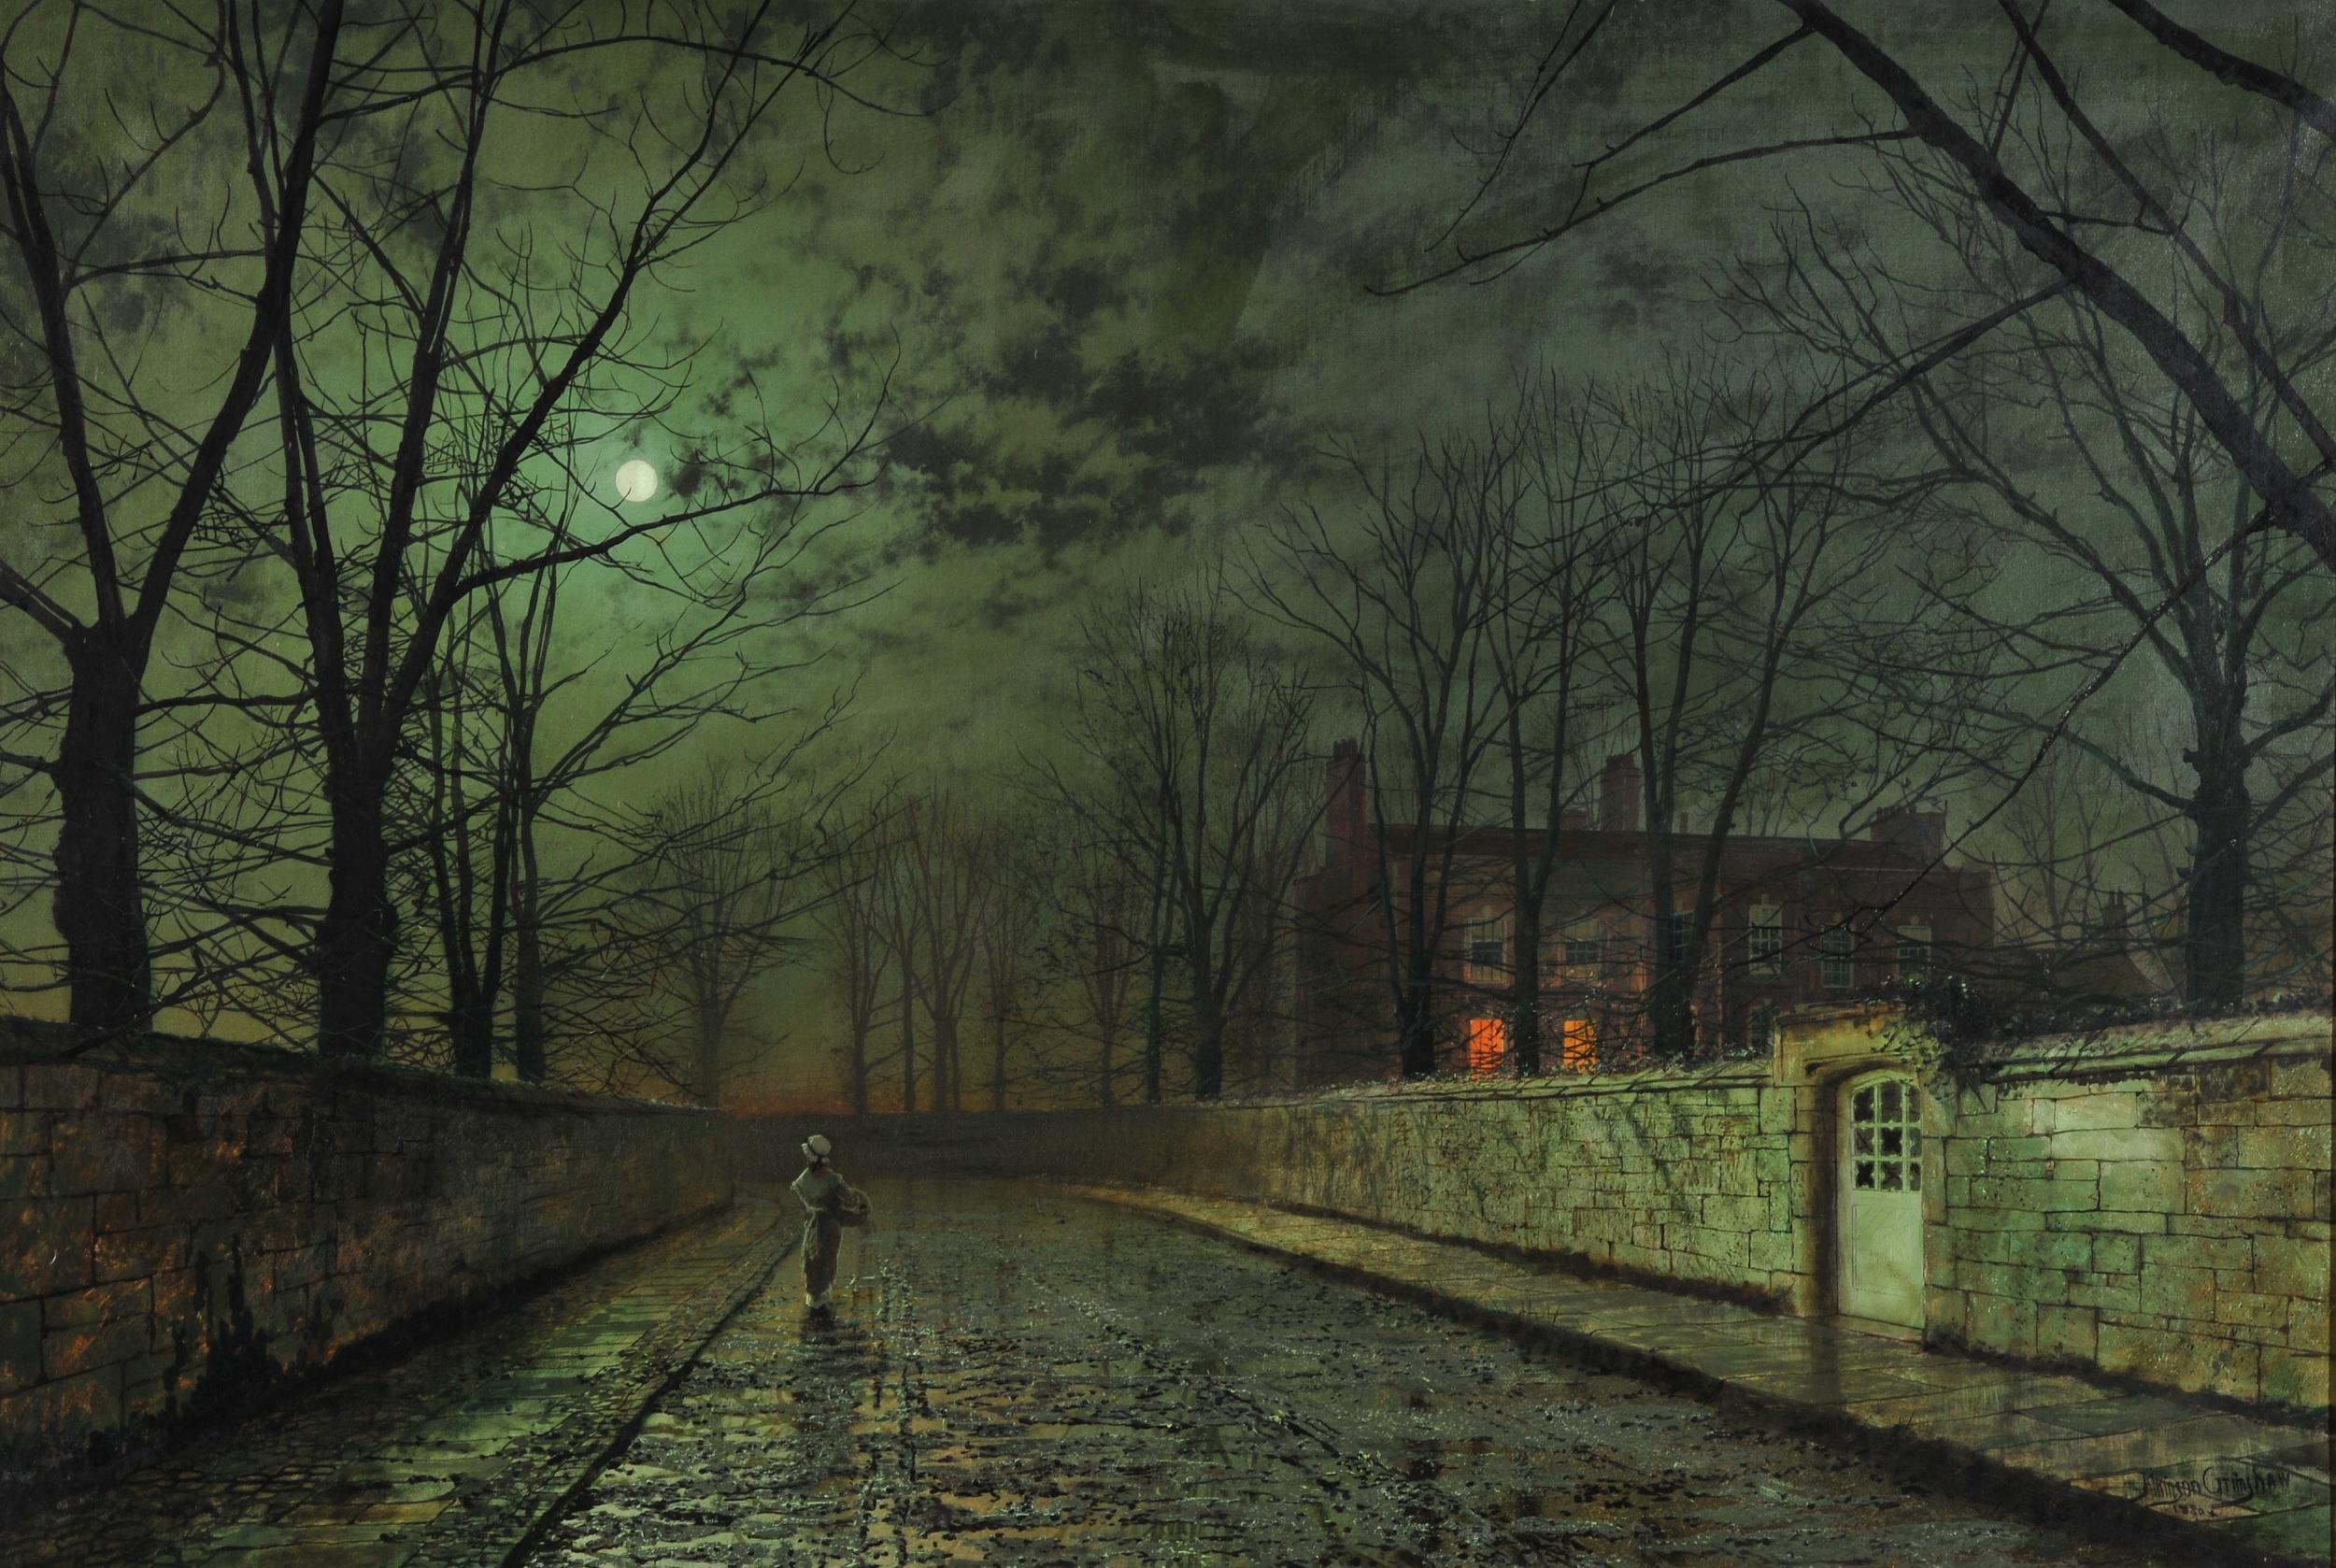 Moonlight After Rain, John Atkinson Grimshaw